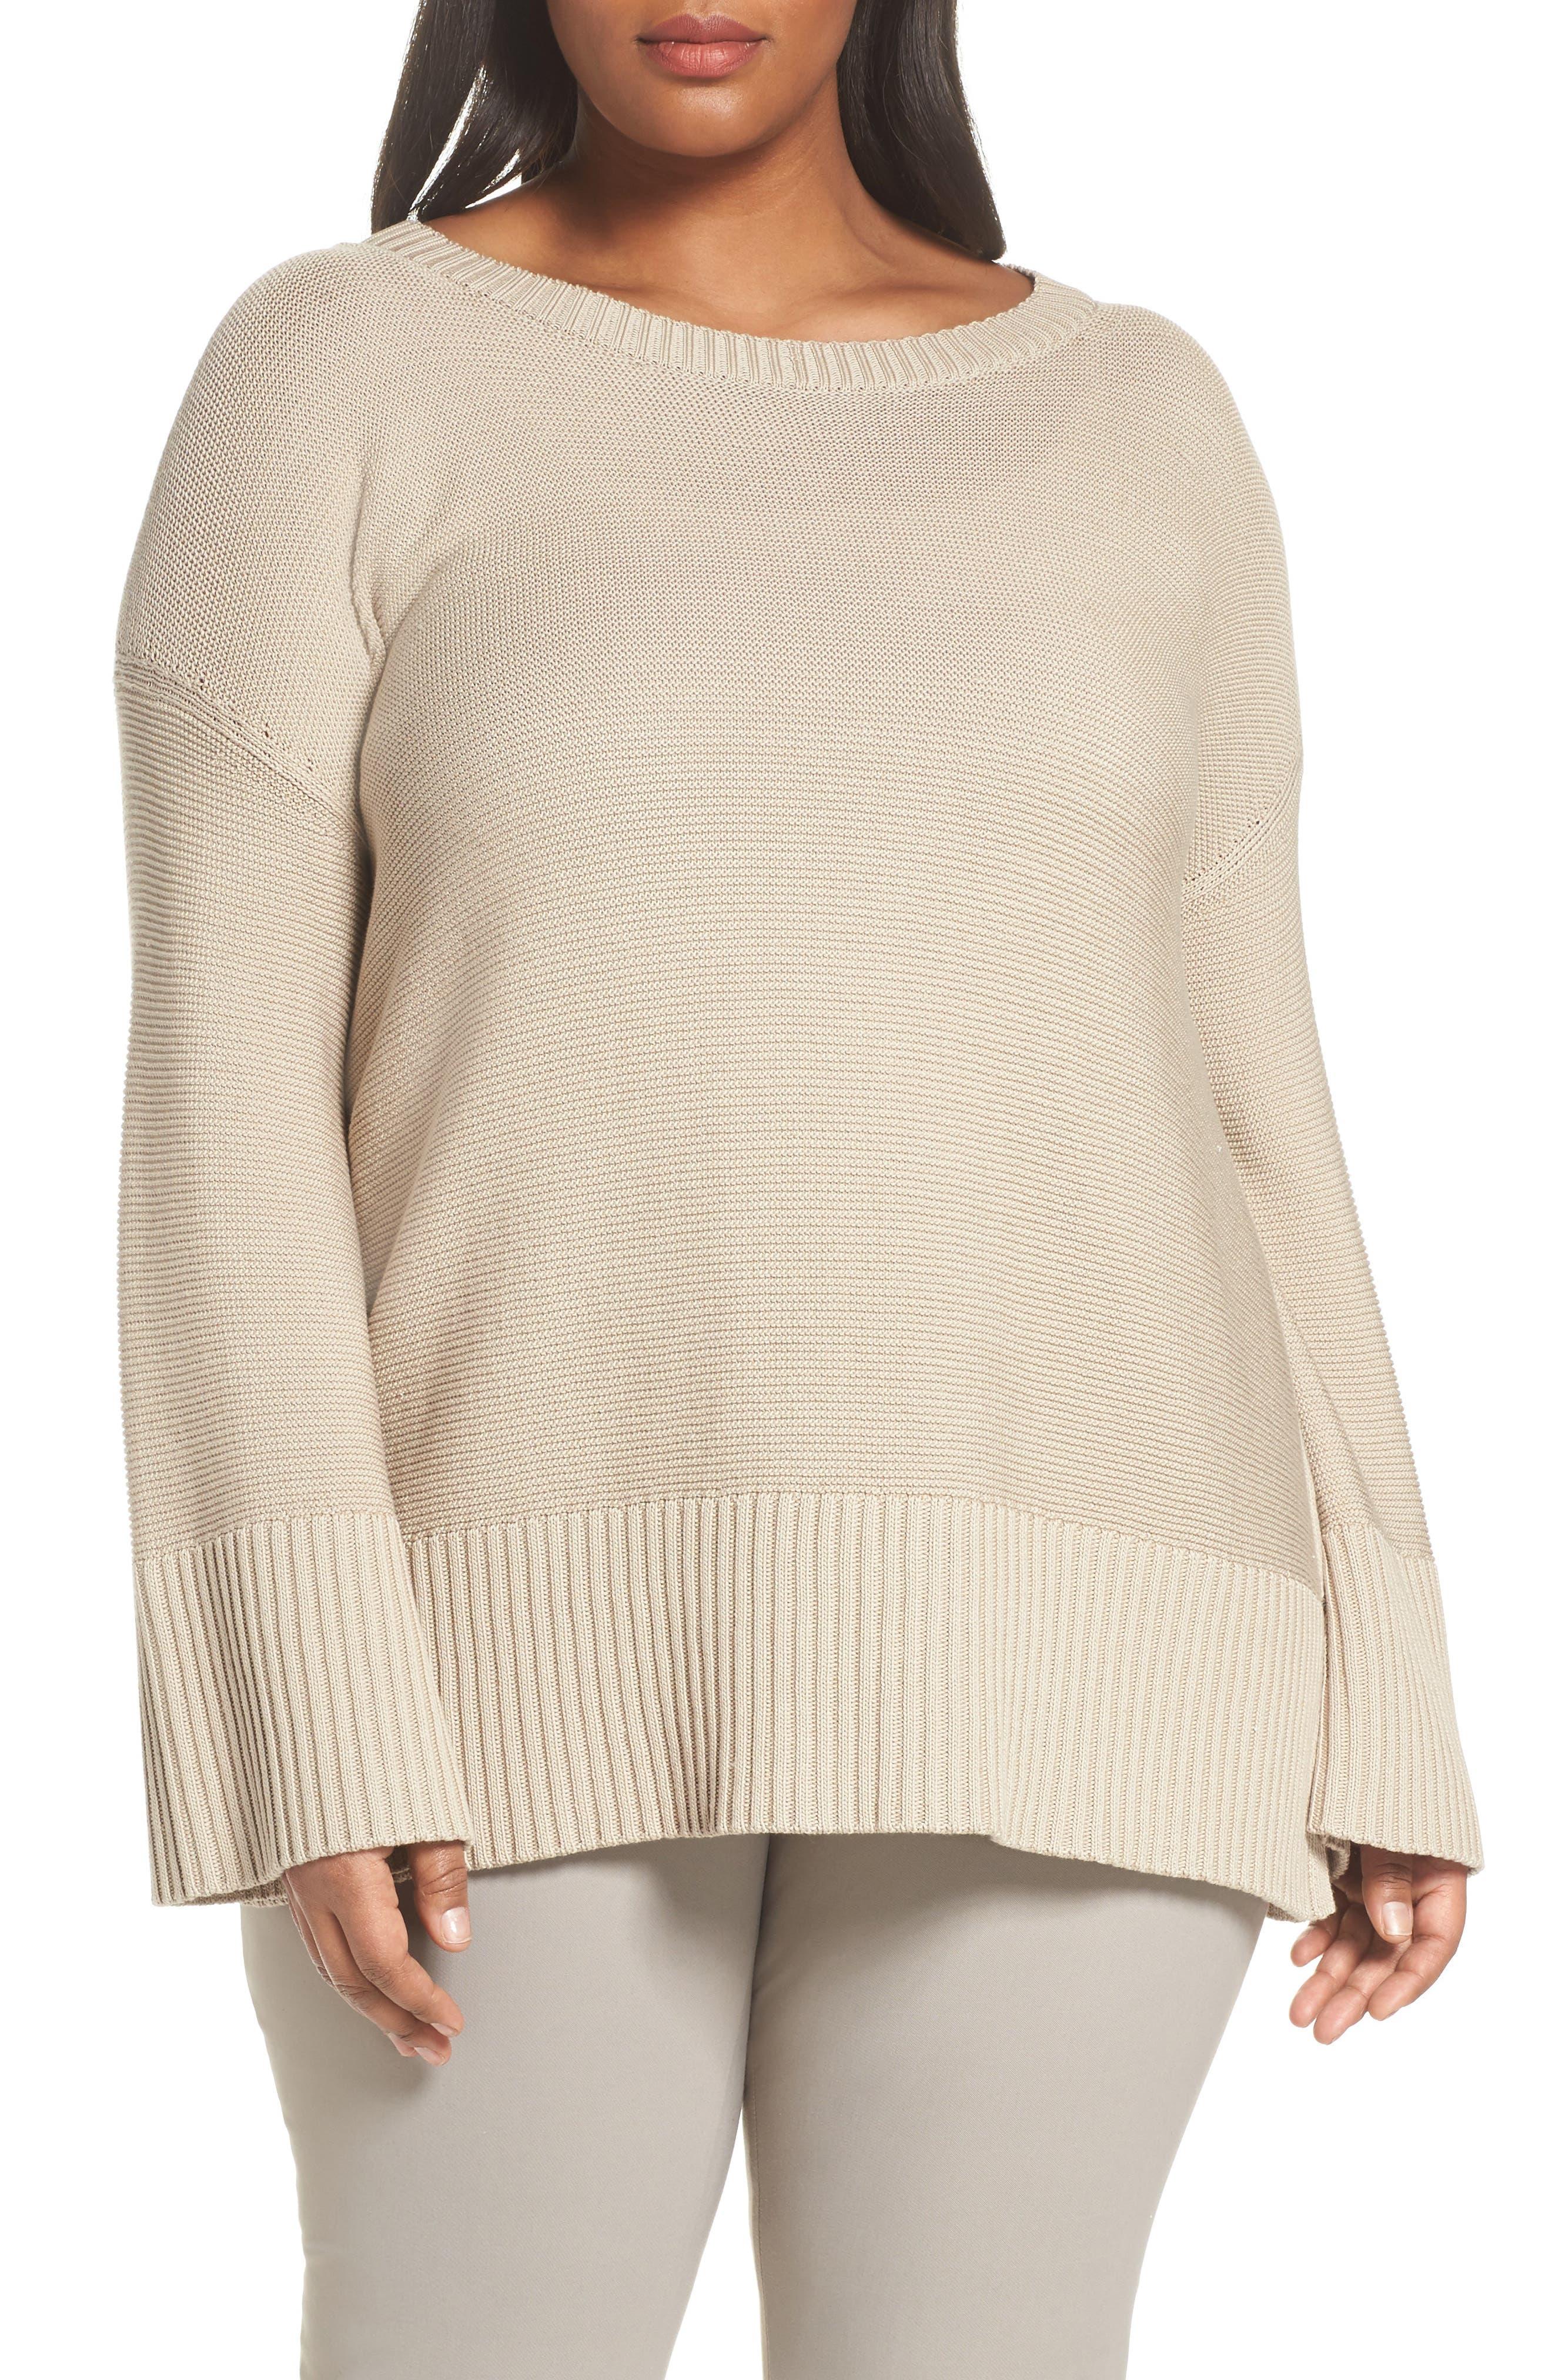 Lafayette 148 Silk and Cotton Sweater (Plus Size)